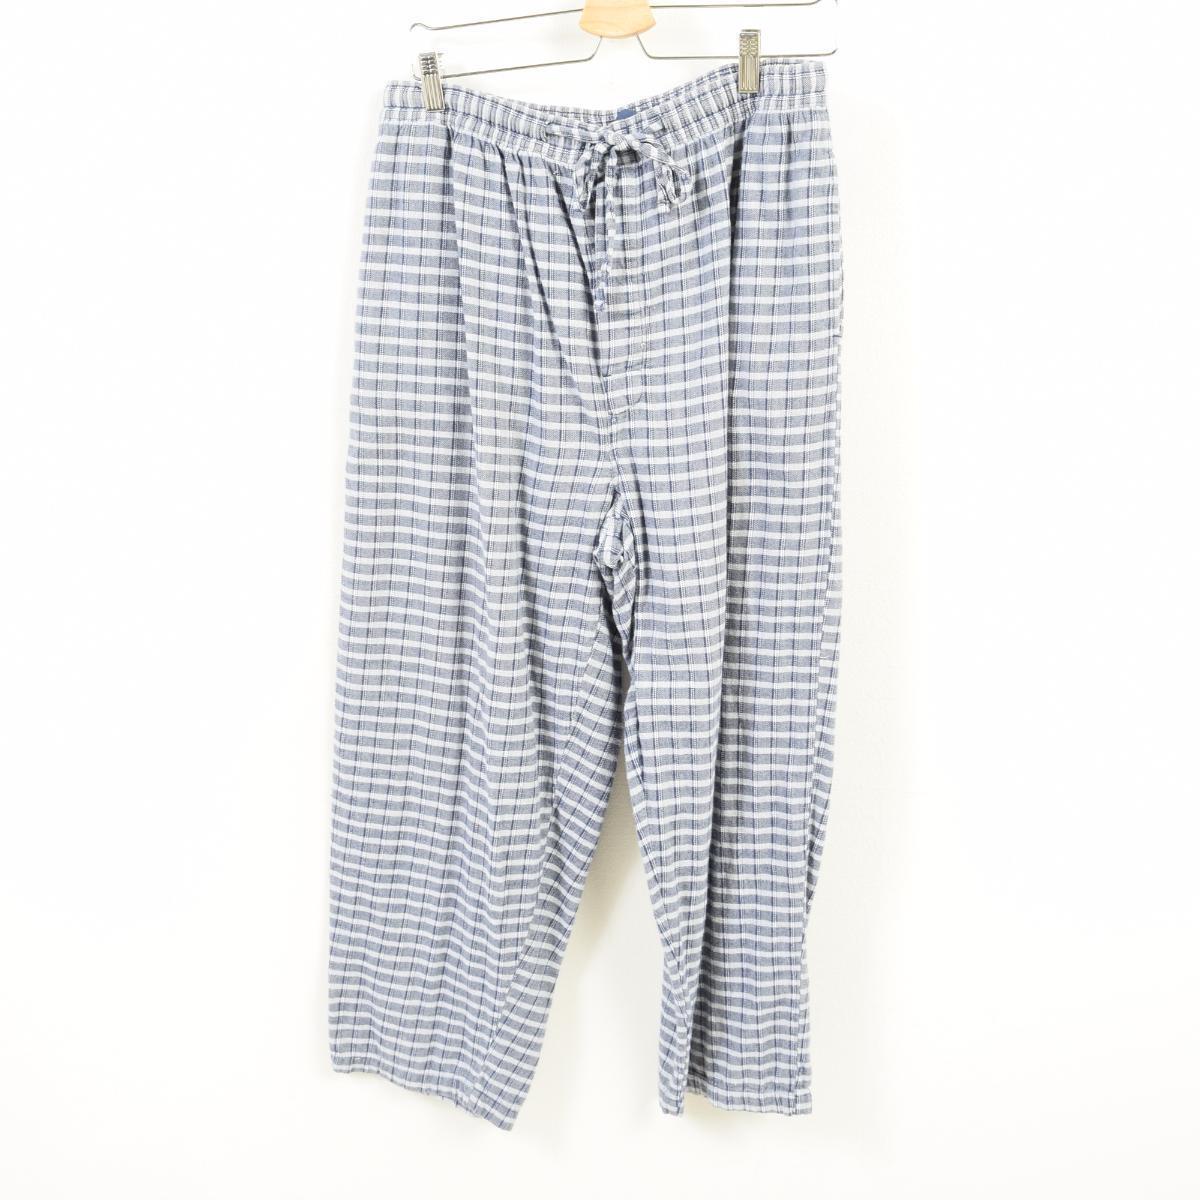 6fa16f33dd54cf Nautica NAUTICA SLEEPWEAR checked pattern pajamas underwear easy underwear  men L  wav5092